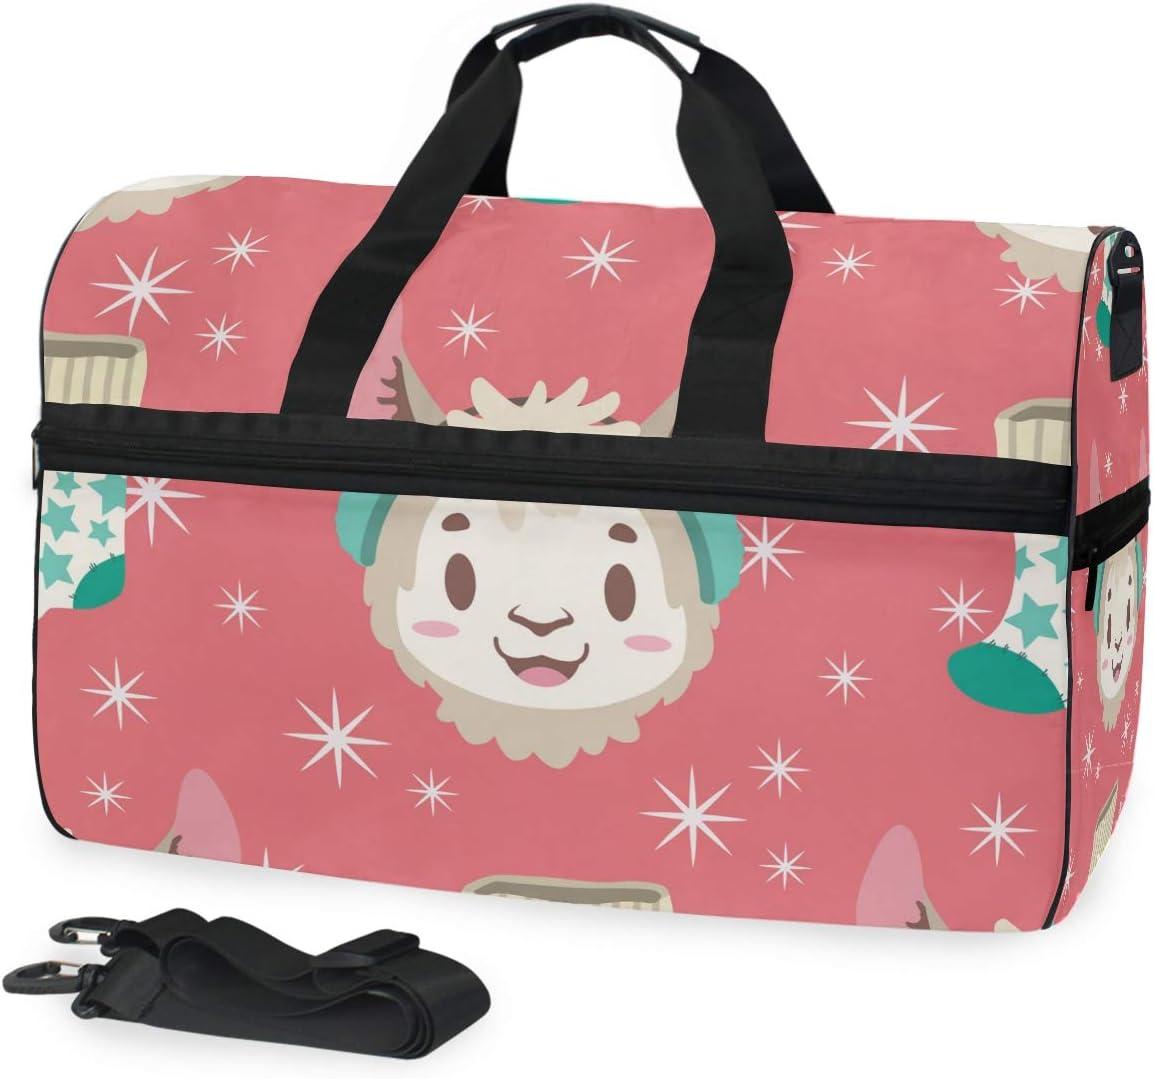 Travel Duffels Llama And Christmas Stocking Duffle Bag Luggage Sports Gym for Women /& Men